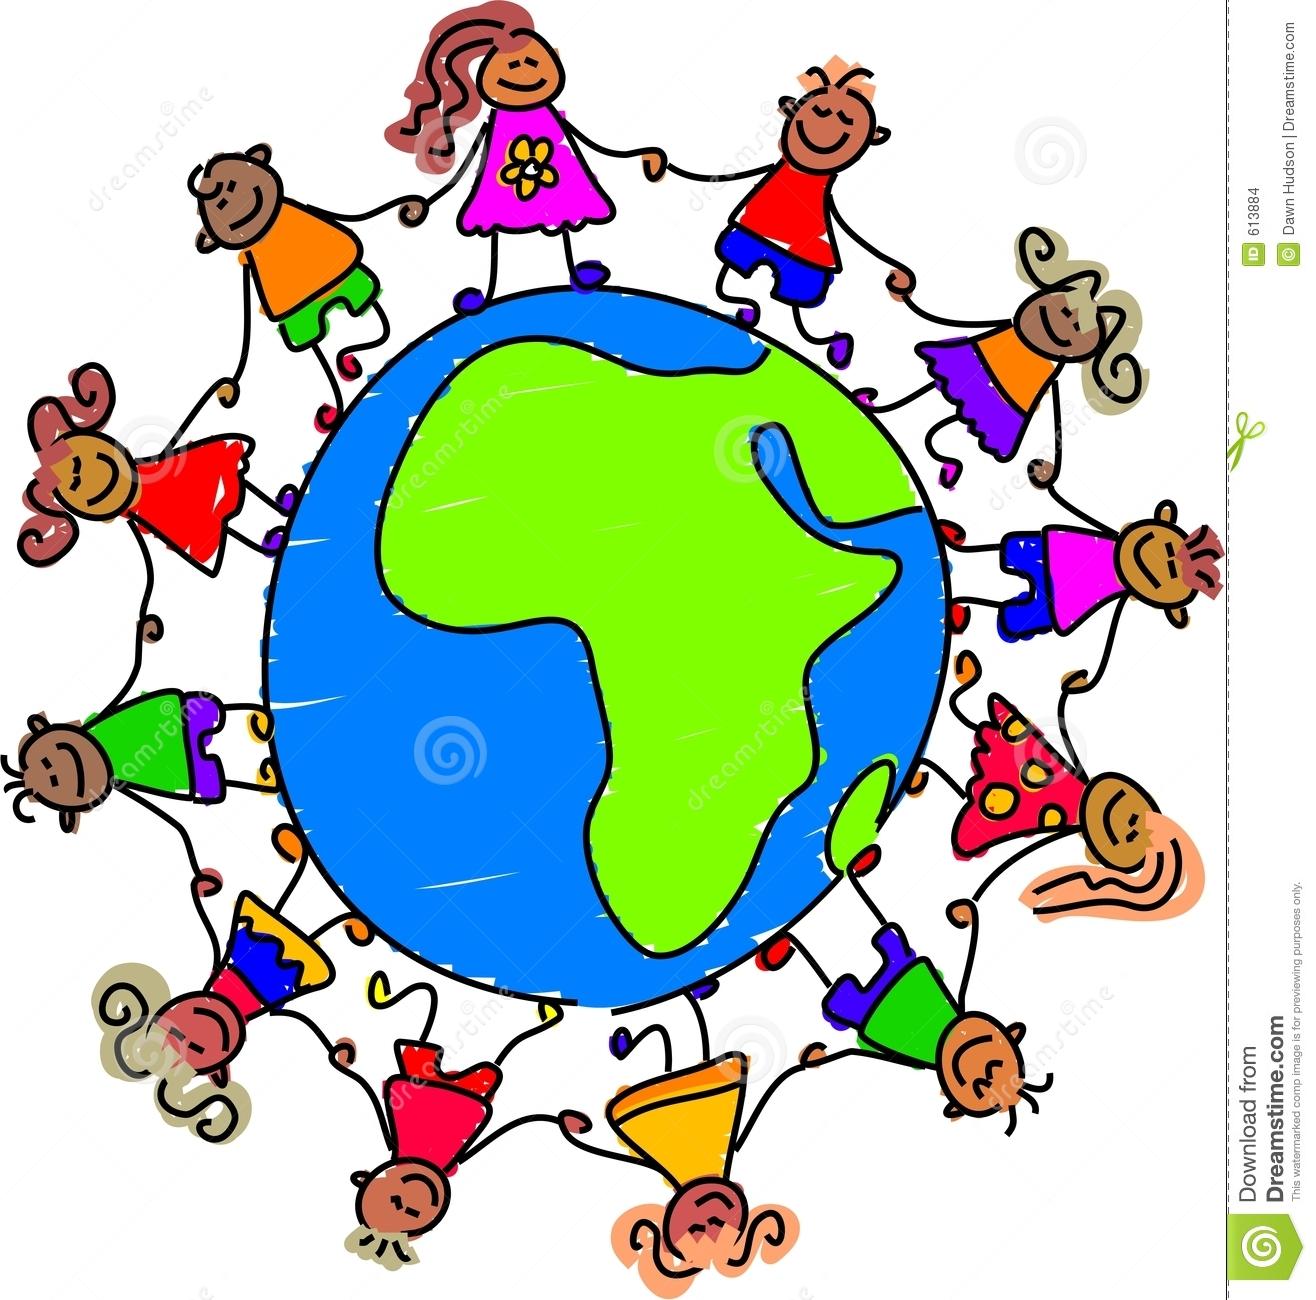 hight resolution of 1316x1300 around child clipart world